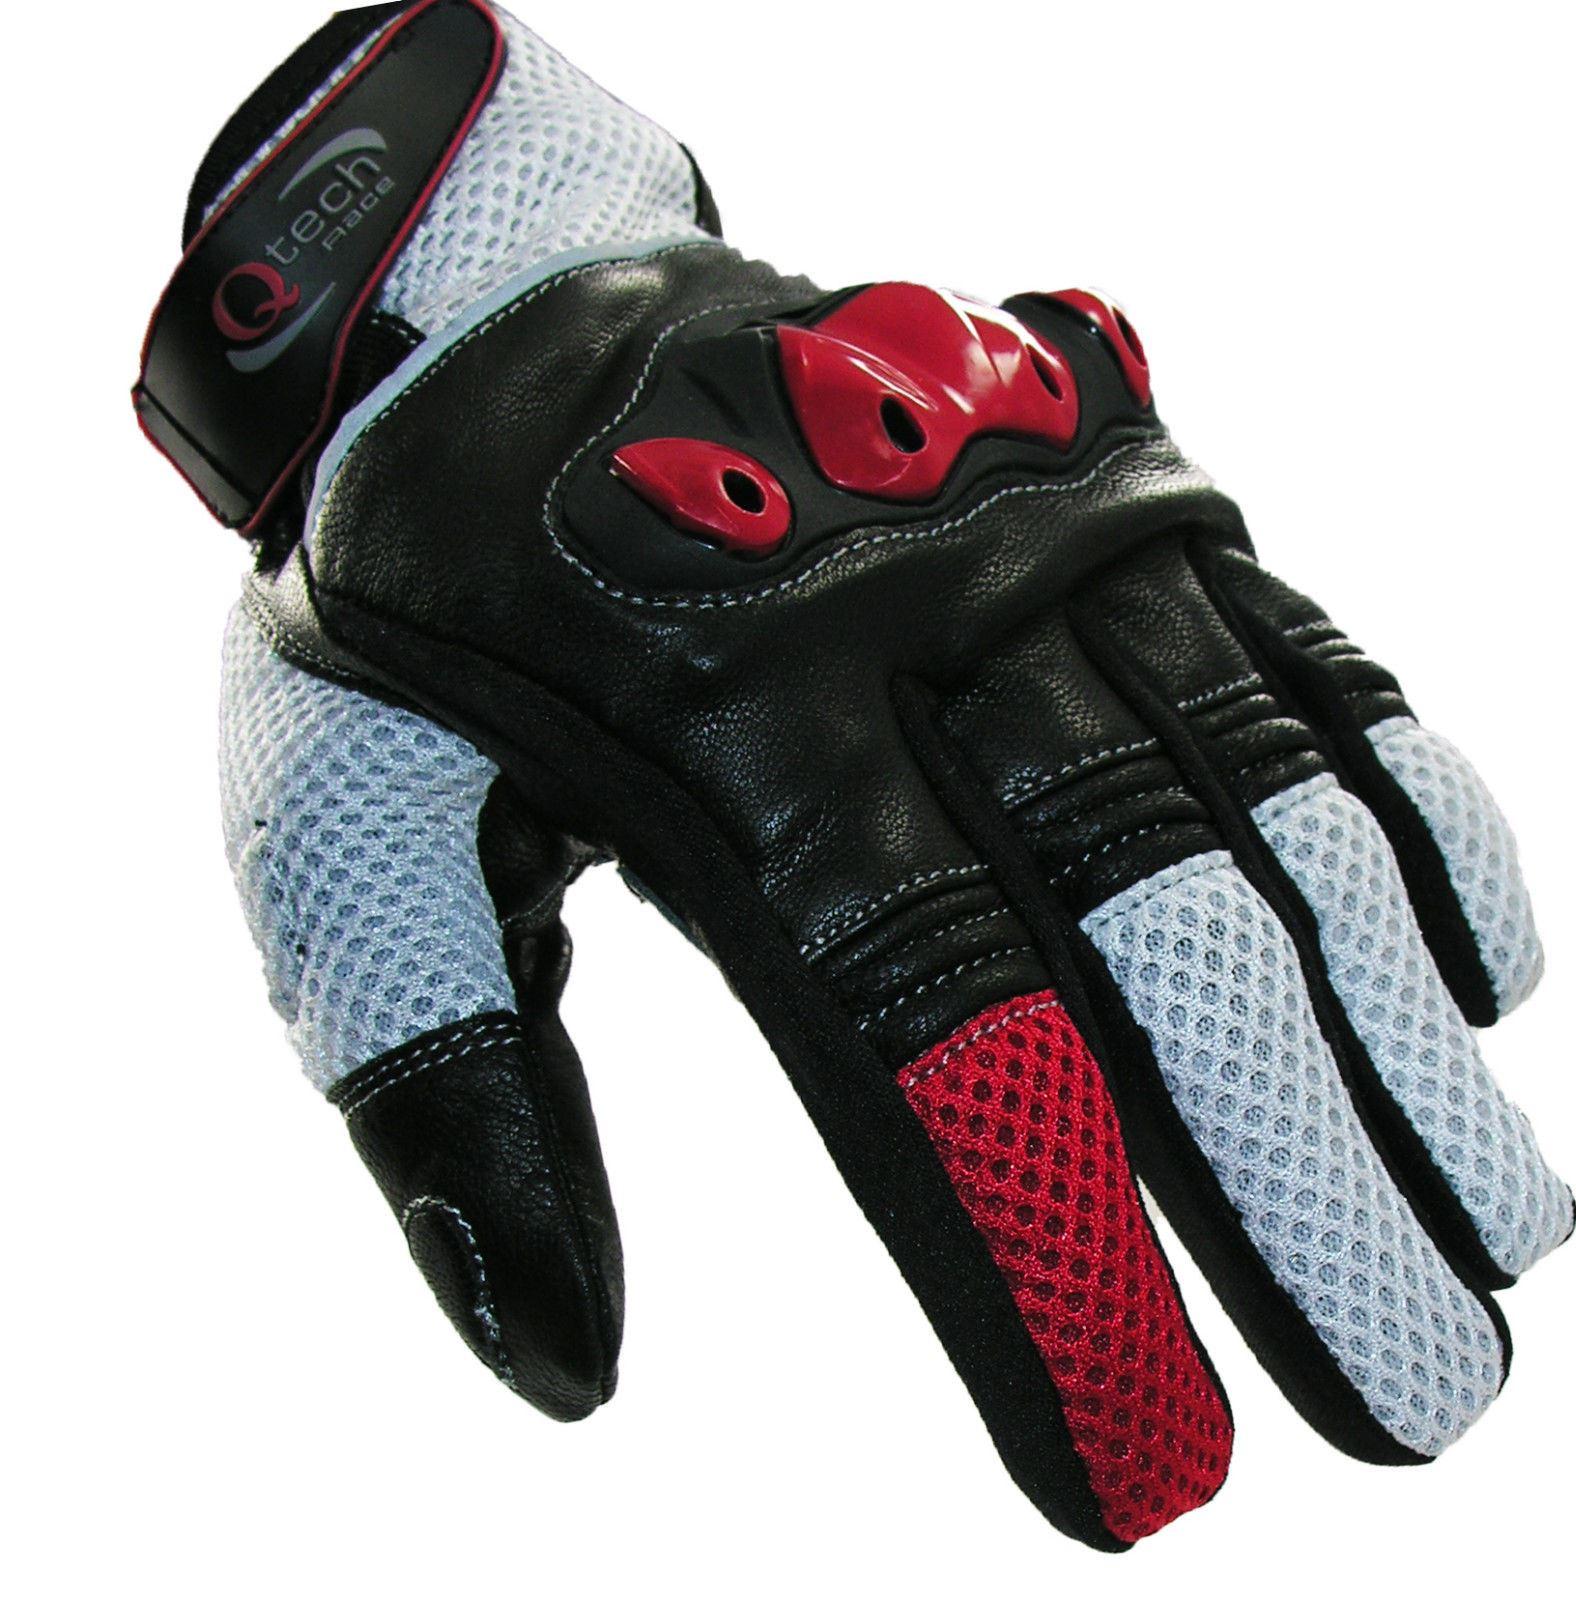 qtech gants courts de moto articulations renforc es ebay. Black Bedroom Furniture Sets. Home Design Ideas